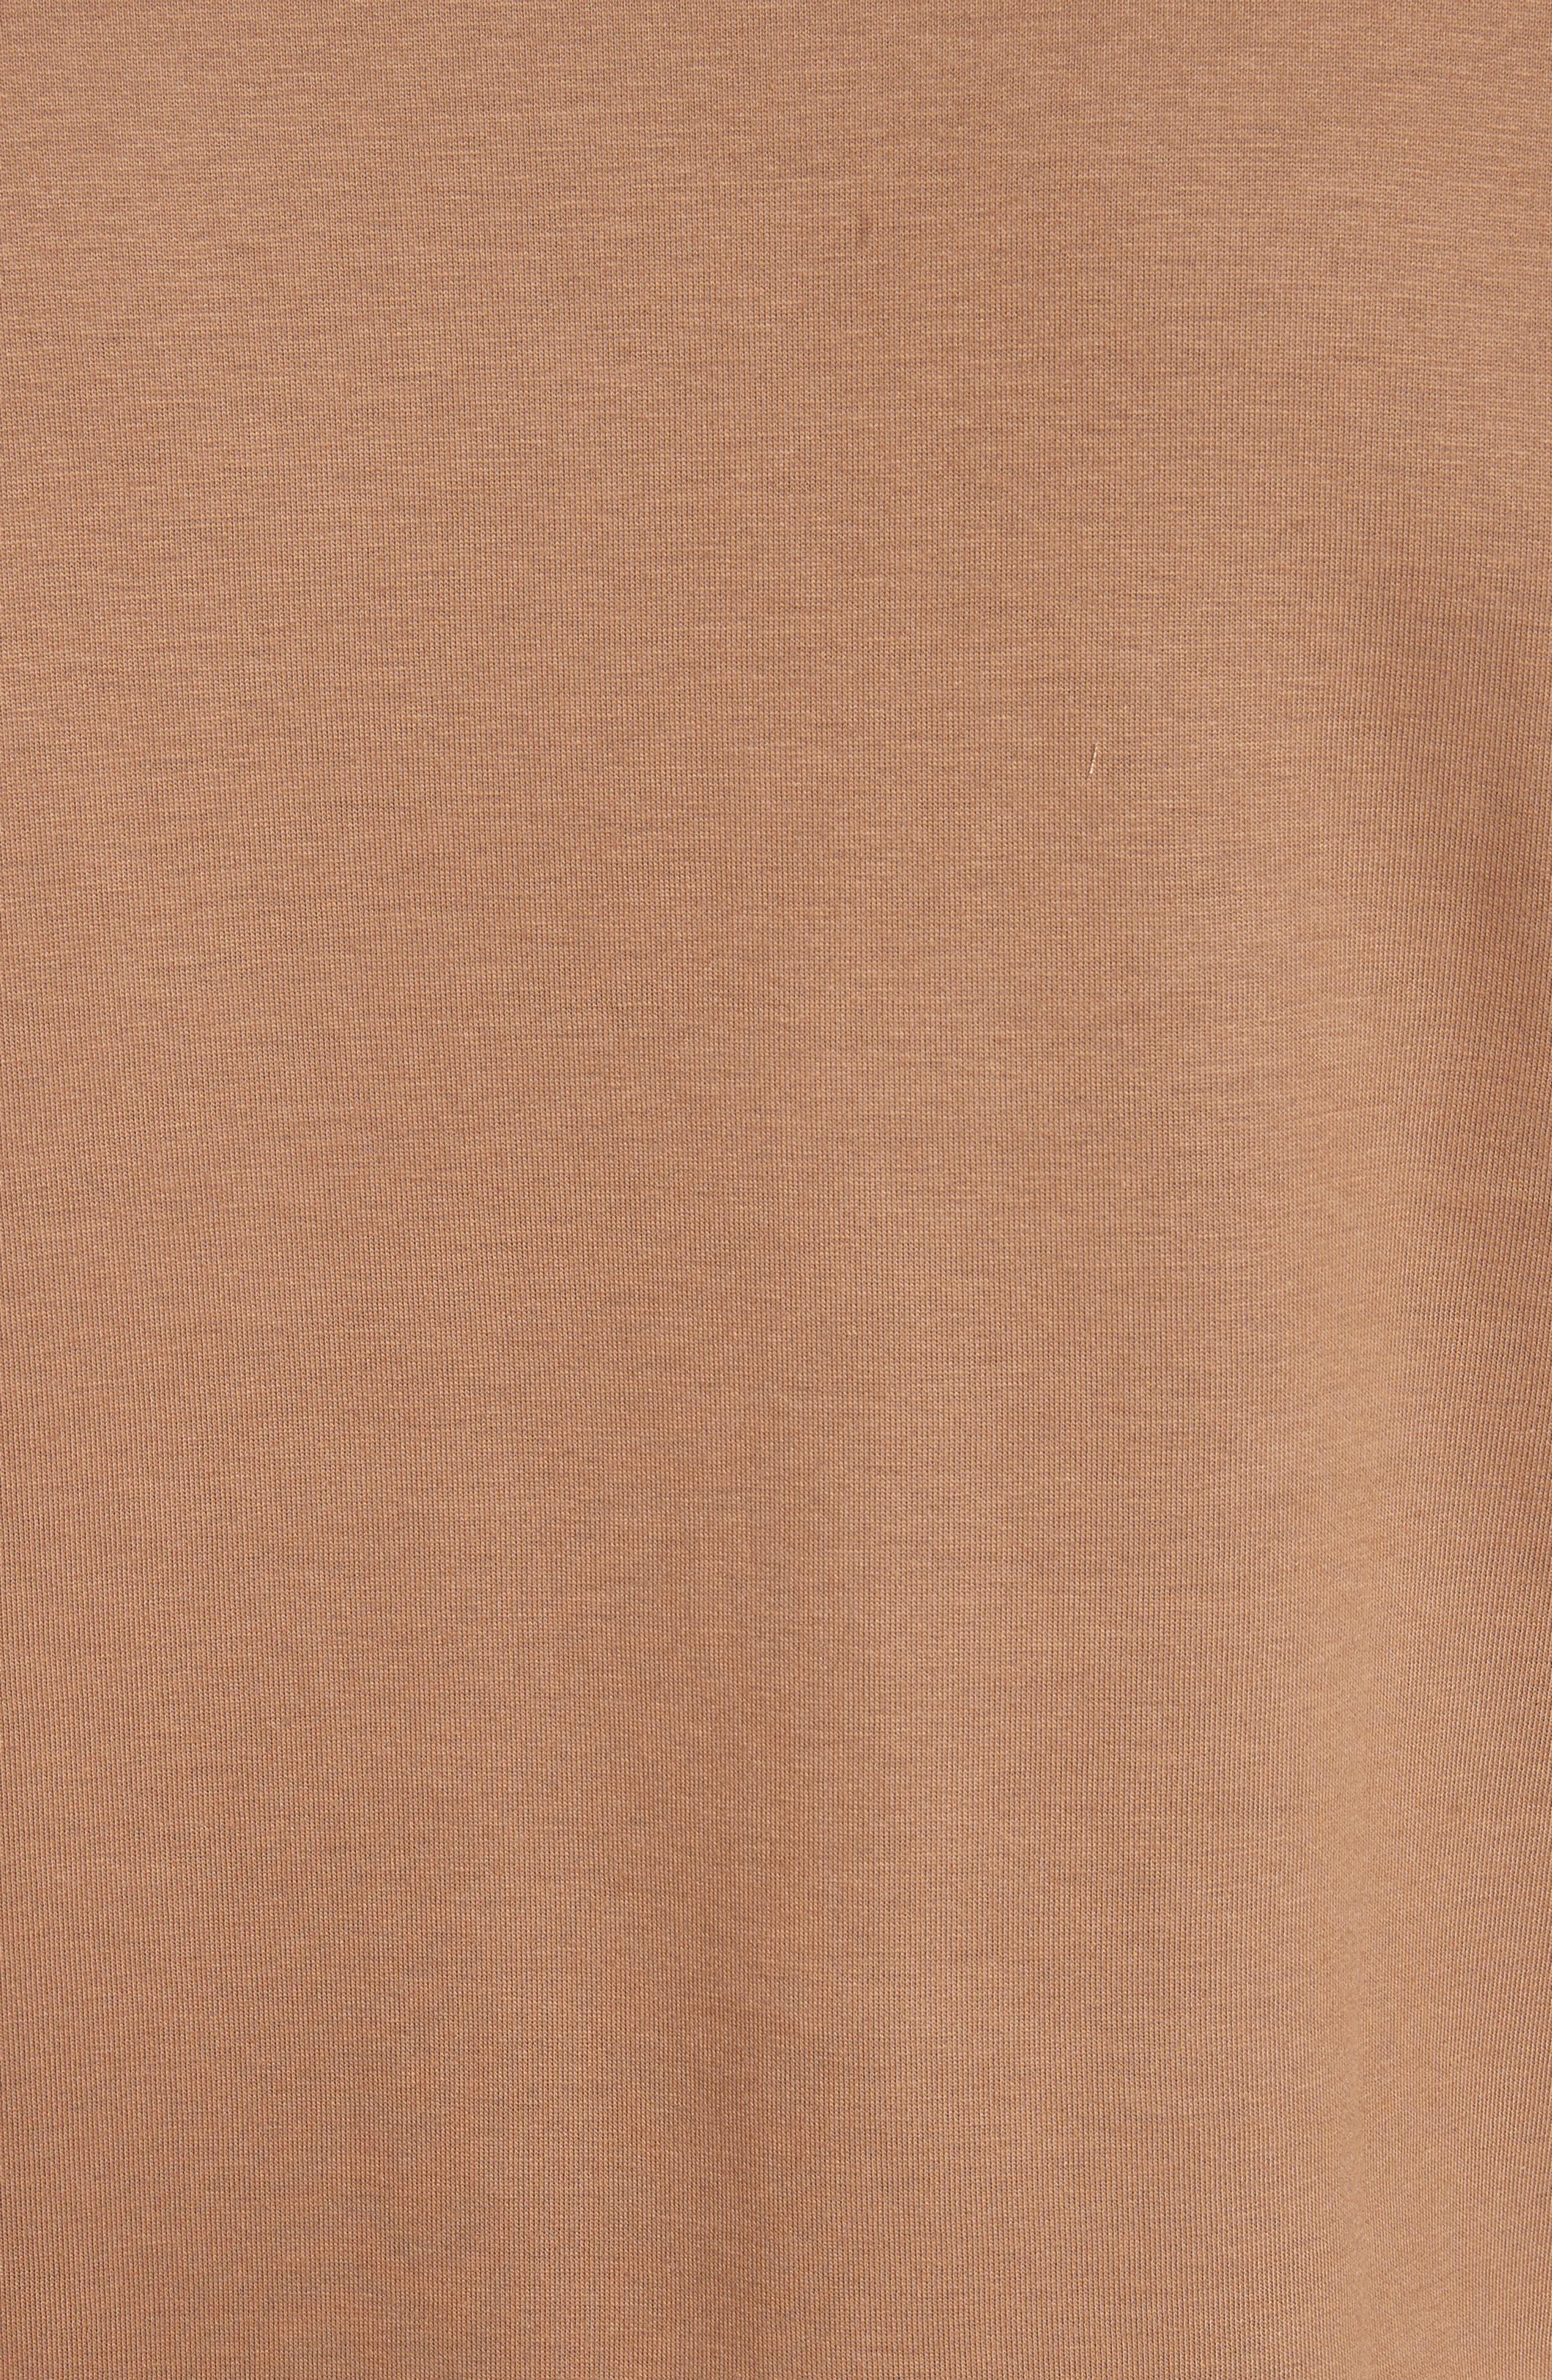 Ketel Dry Mercerized Crewneck Sweatshirt,                             Alternate thumbnail 5, color,                             Light Sand